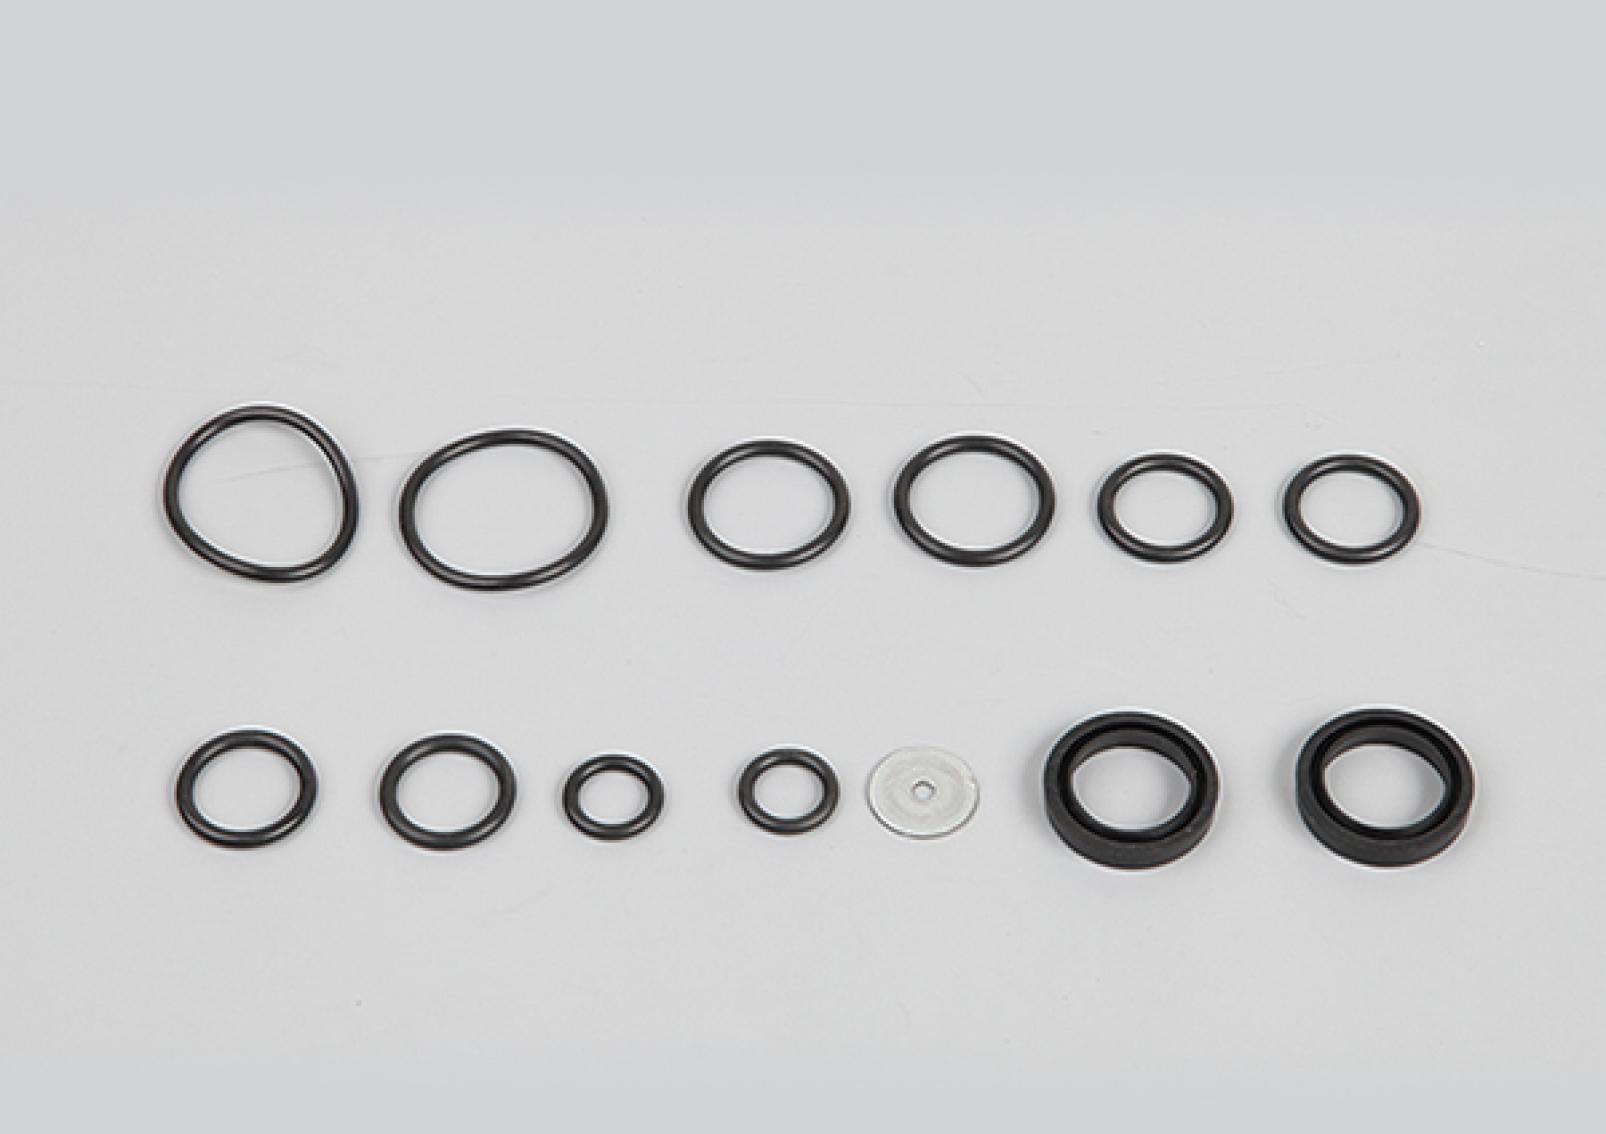 Abs Park Release Valve Repair Kit, 352 044 001